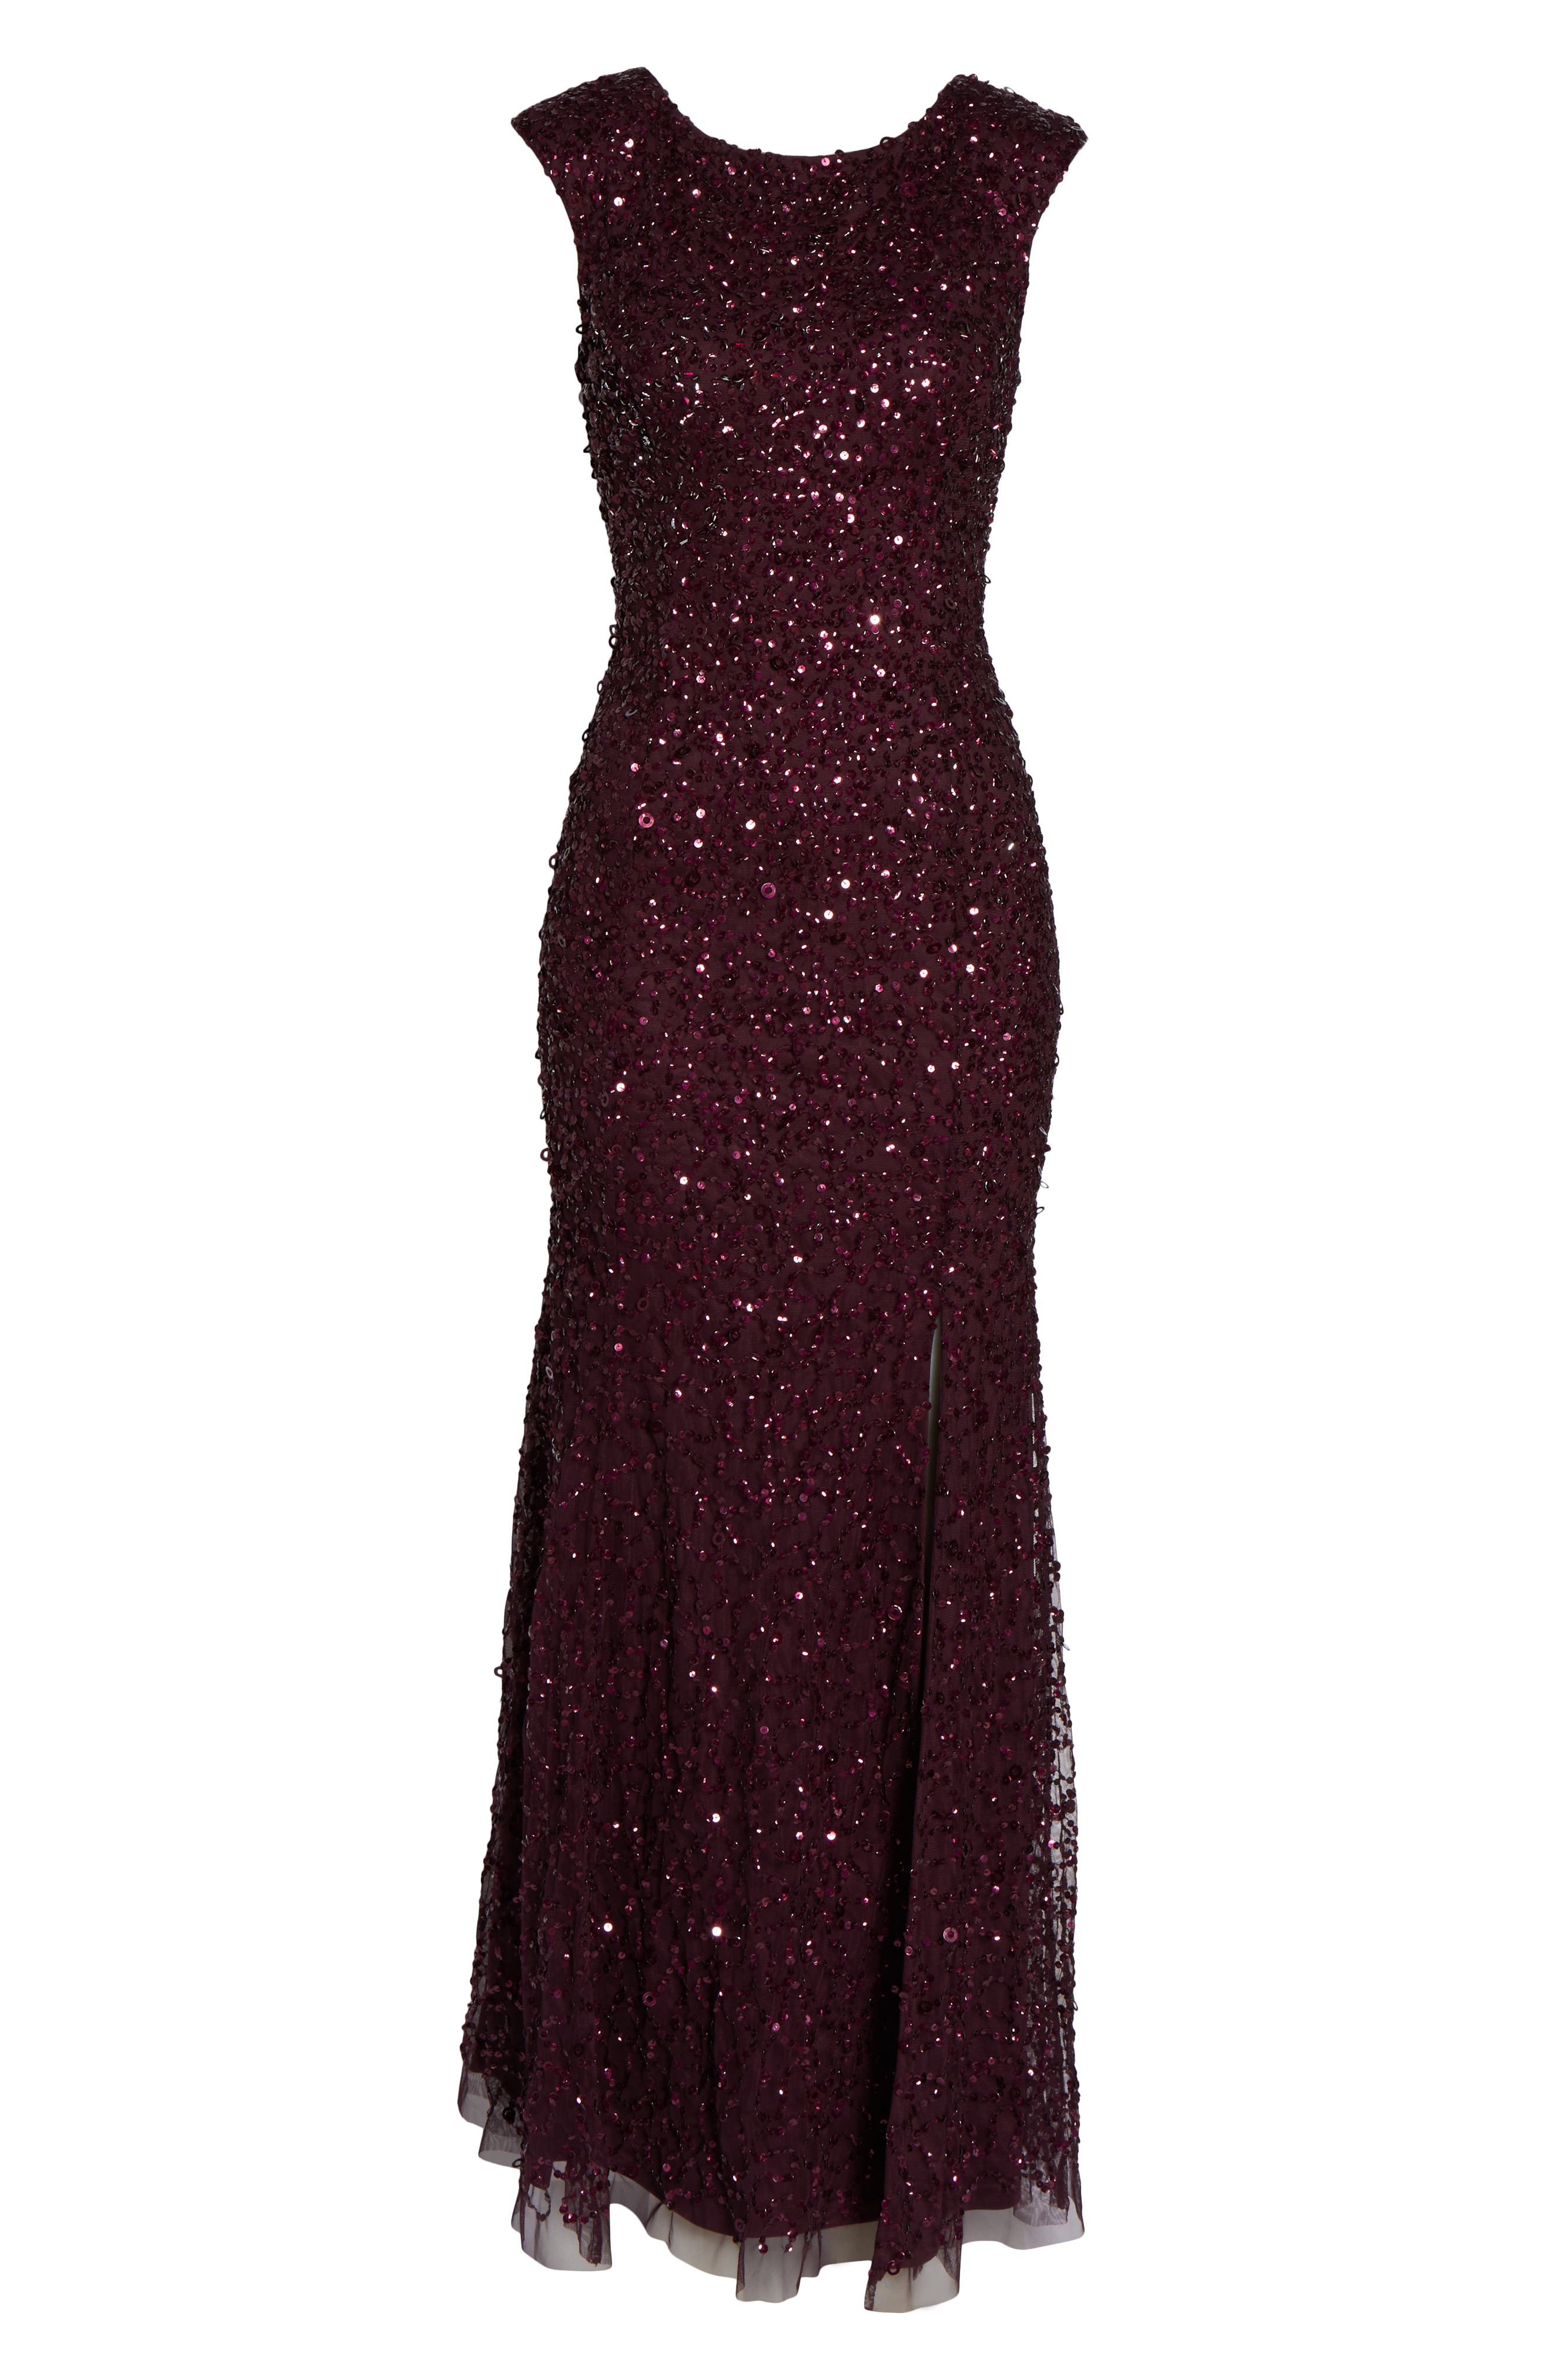 Sequin Evening Dress,                             Alternate thumbnail 7, color,                             NIGHT PLUM